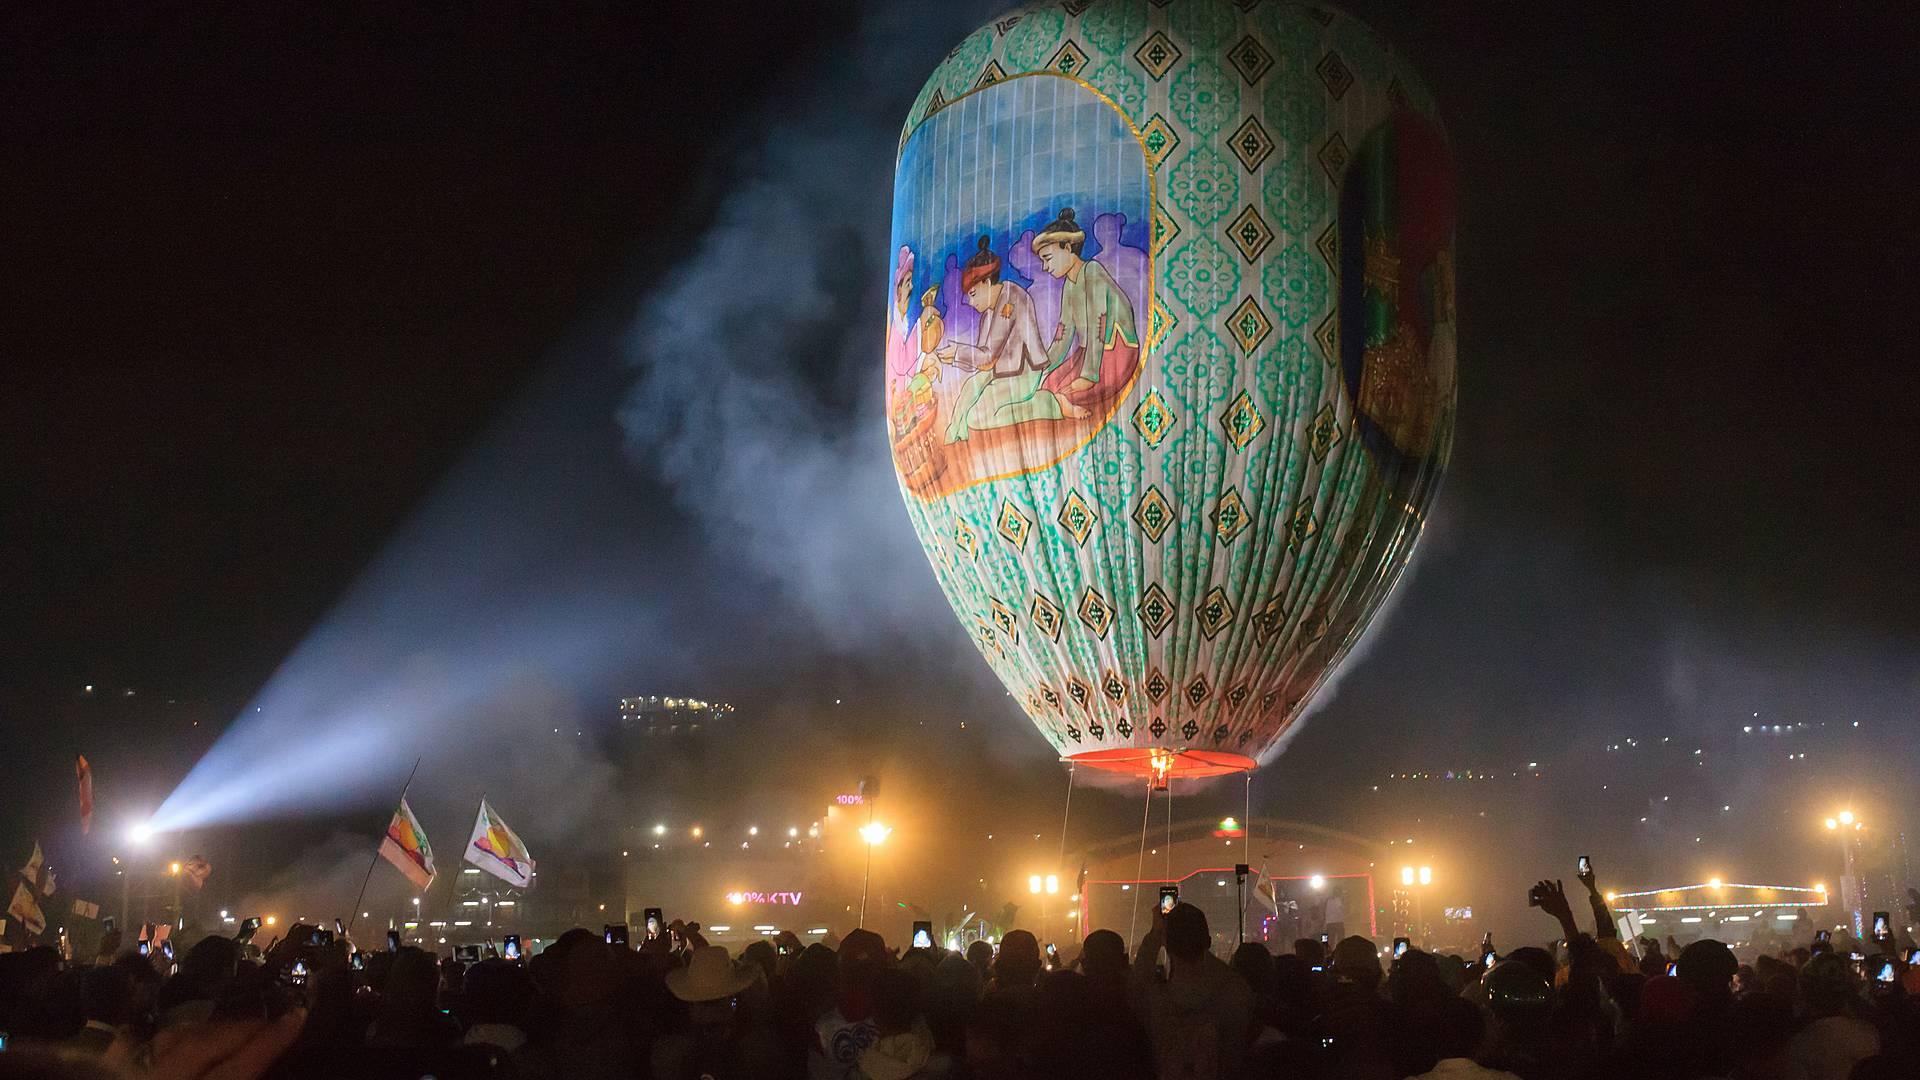 Il pittoresco festival delle mongolfiere a Taunggyi